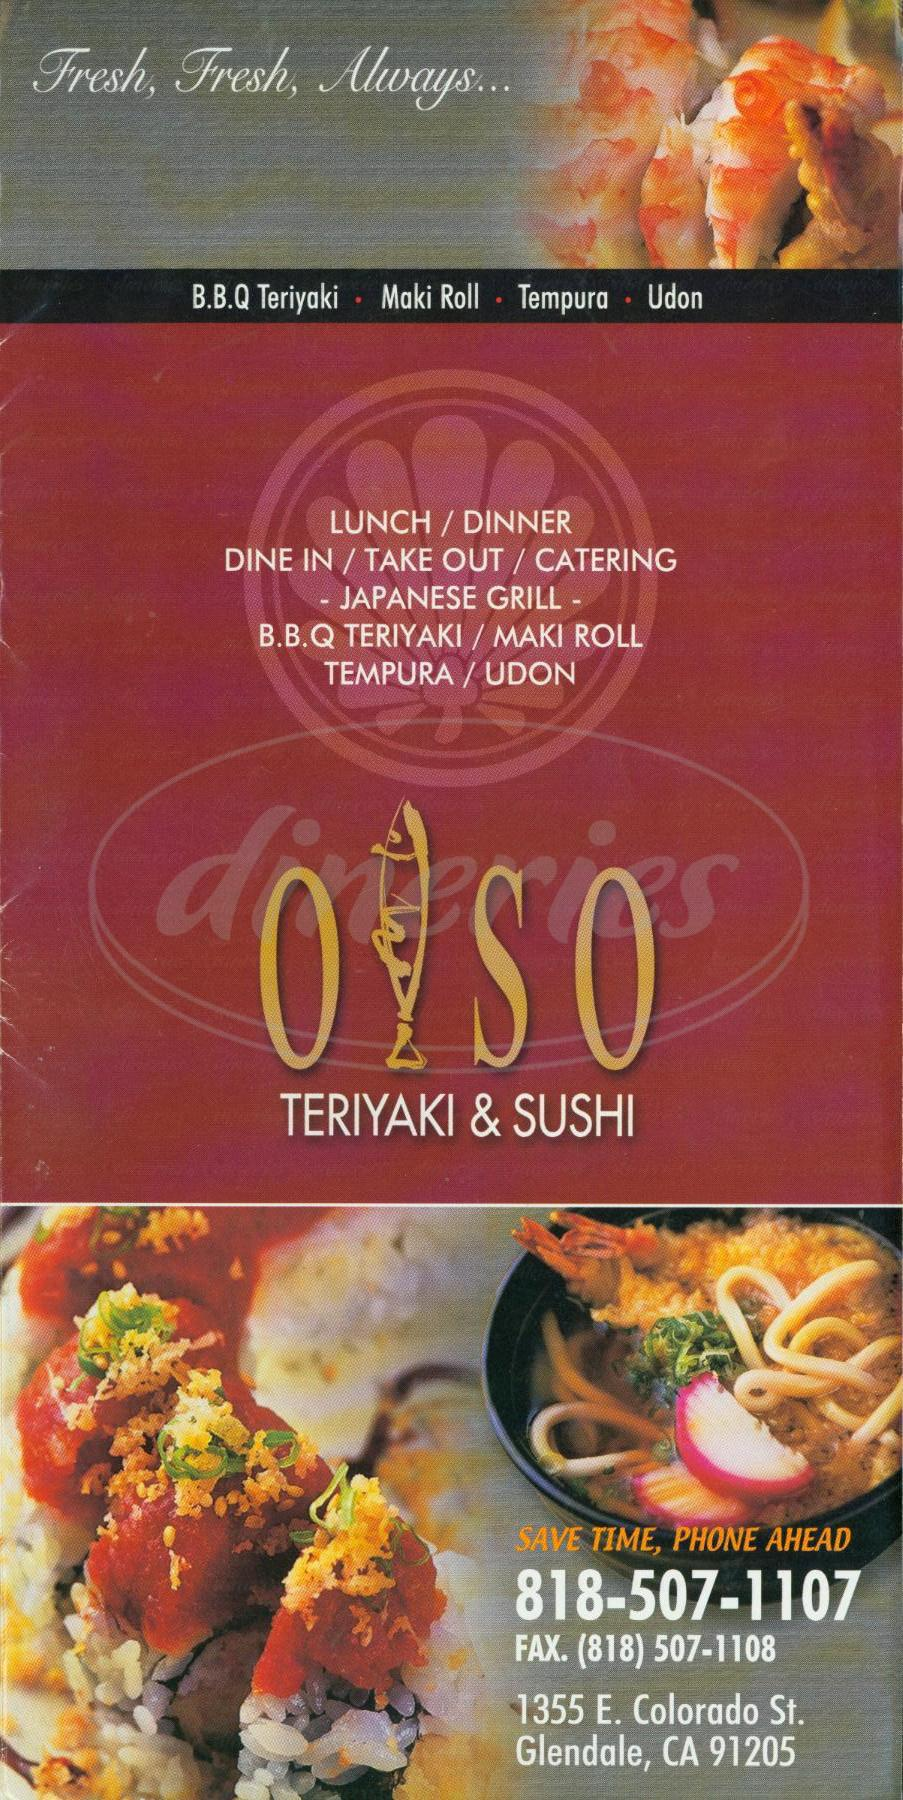 menu for Olso Teriyaki & Sushi